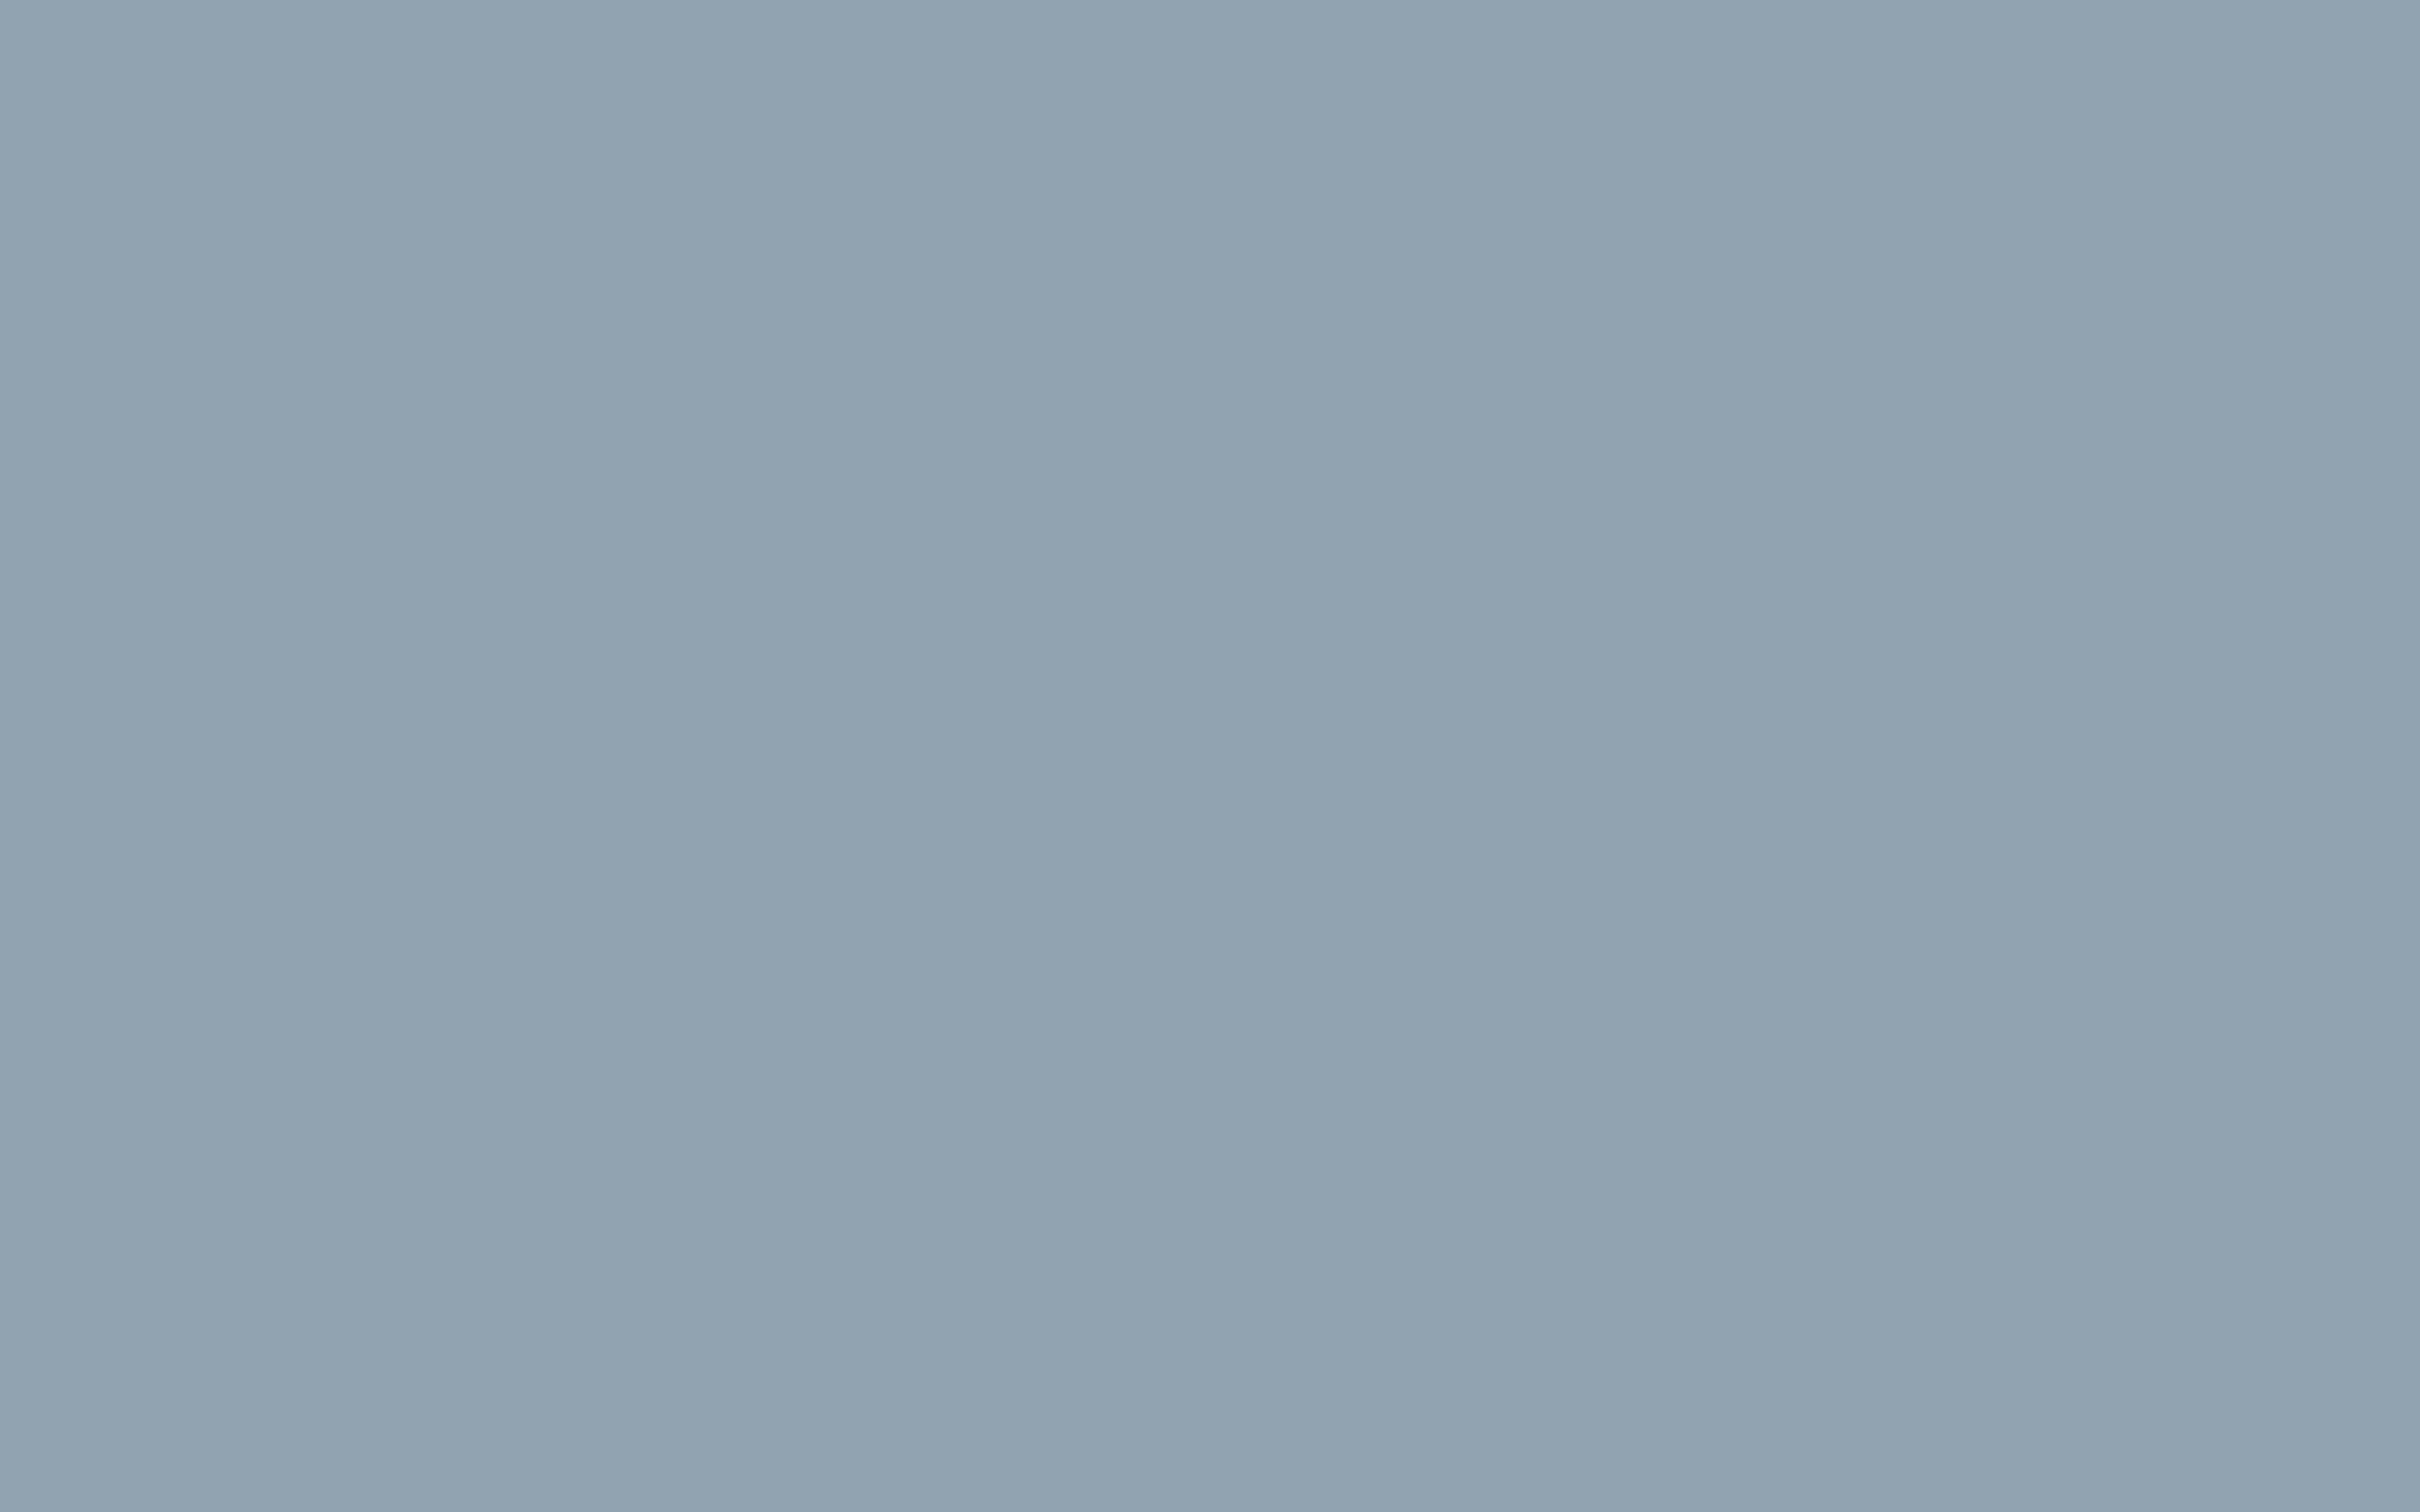 2560x1600 Cadet Grey Solid Color Background